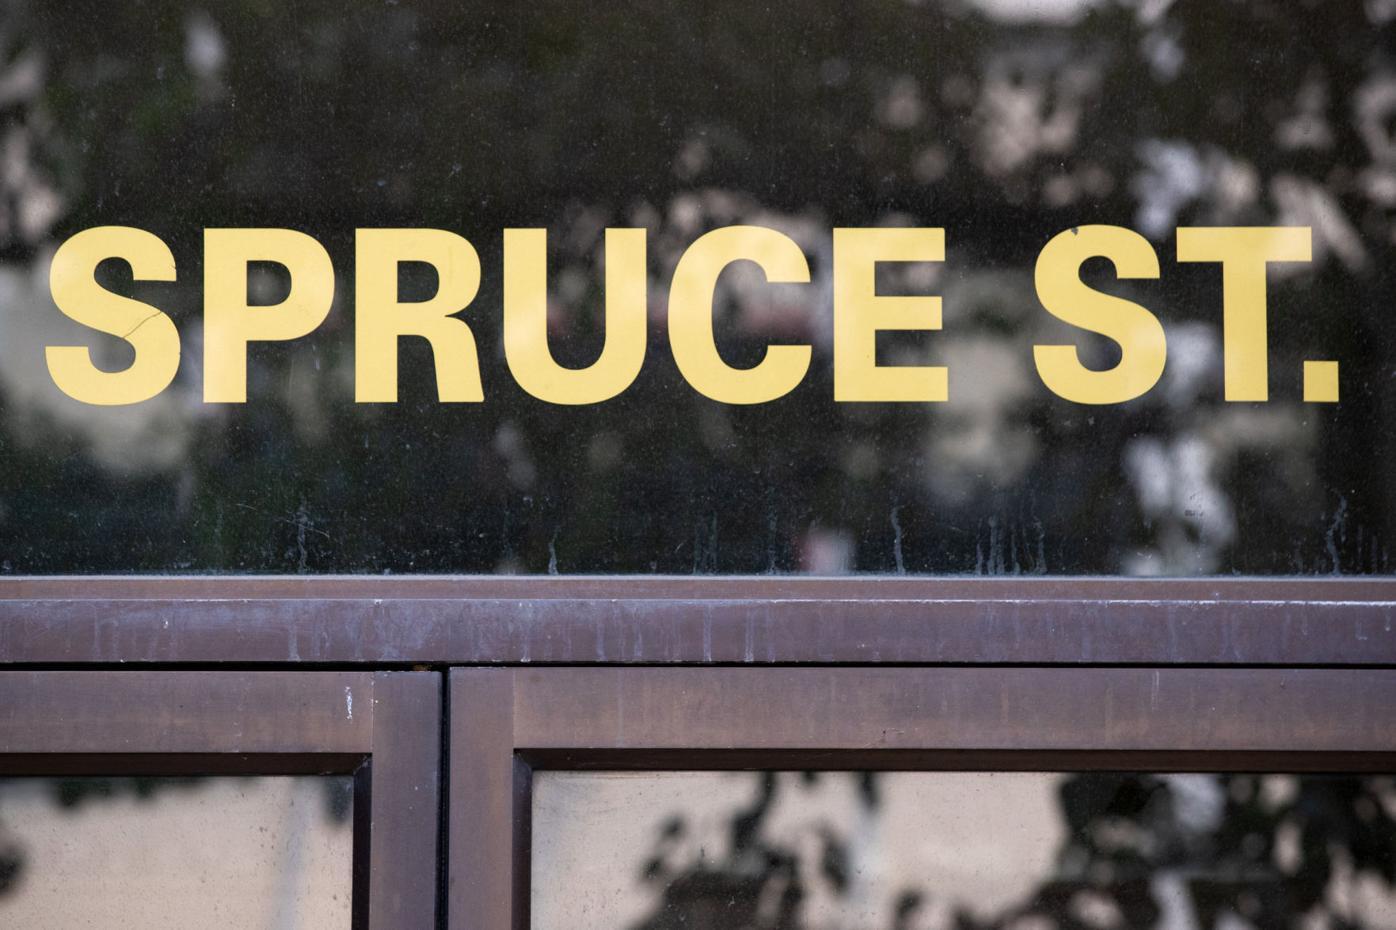 Business owners react to renaming Spruce Street for President Joe Biden